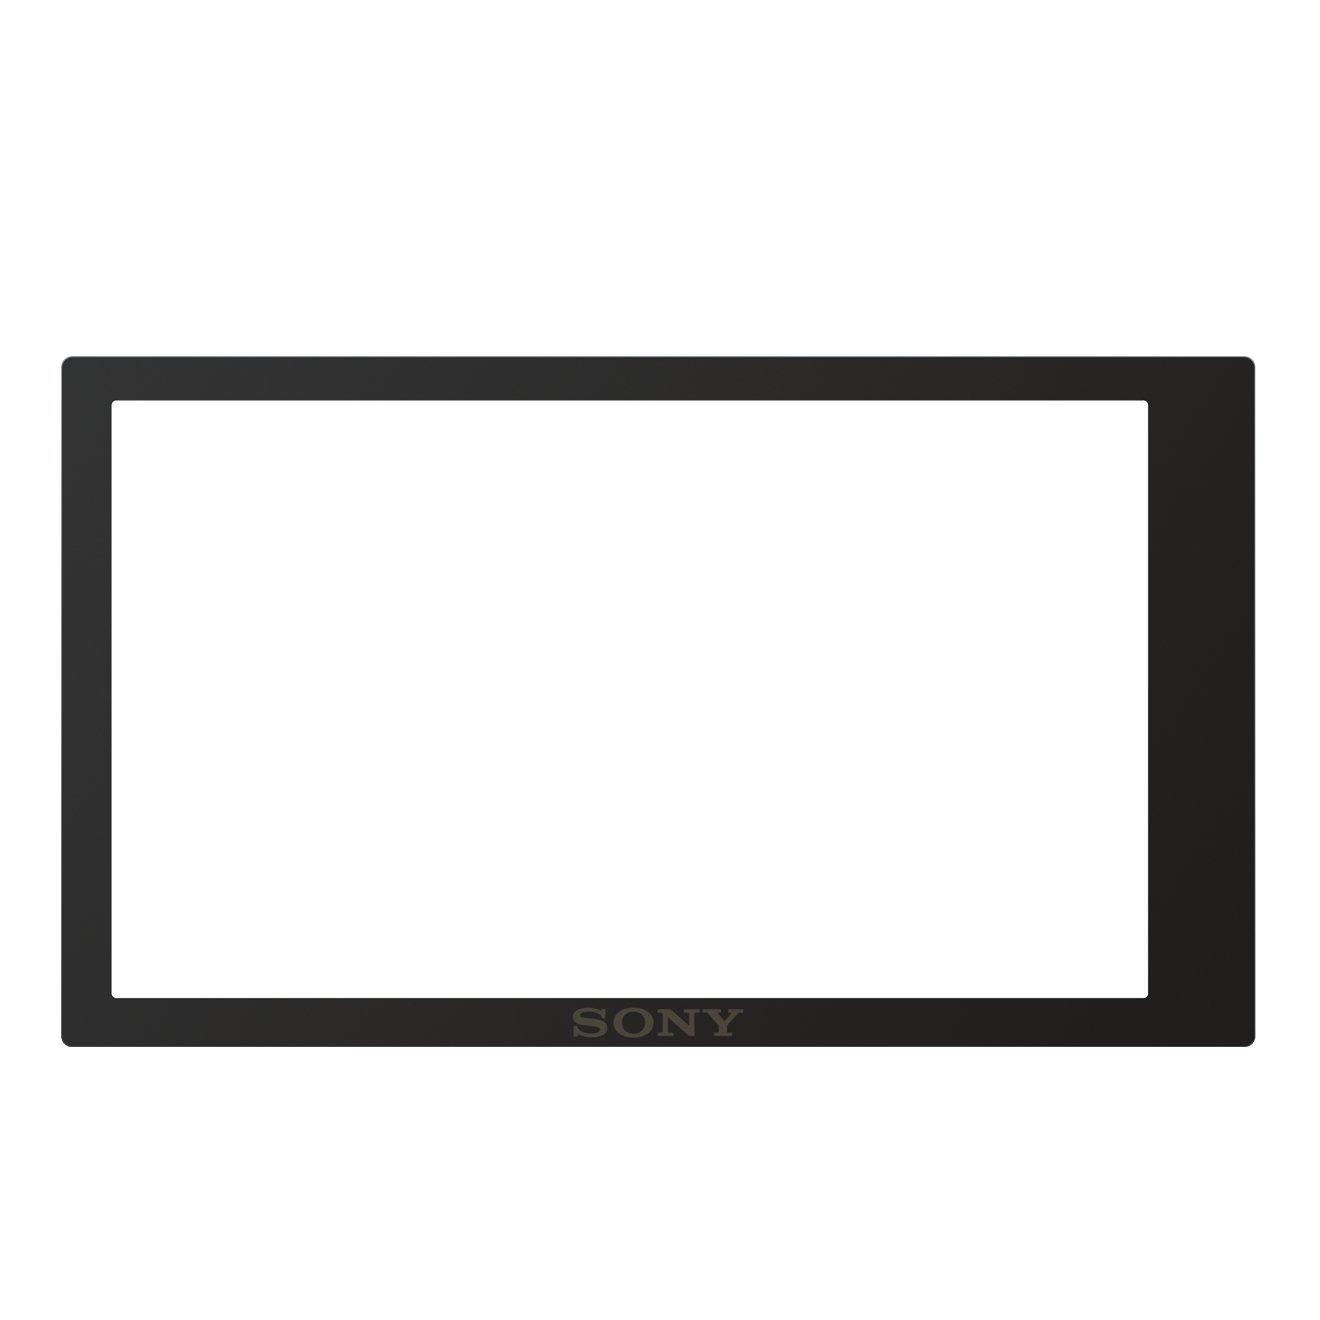 Sony PCKLM17 Screen Protect Semi-Hard Sheet for Sony Alpha A6000 (Black) by Sony